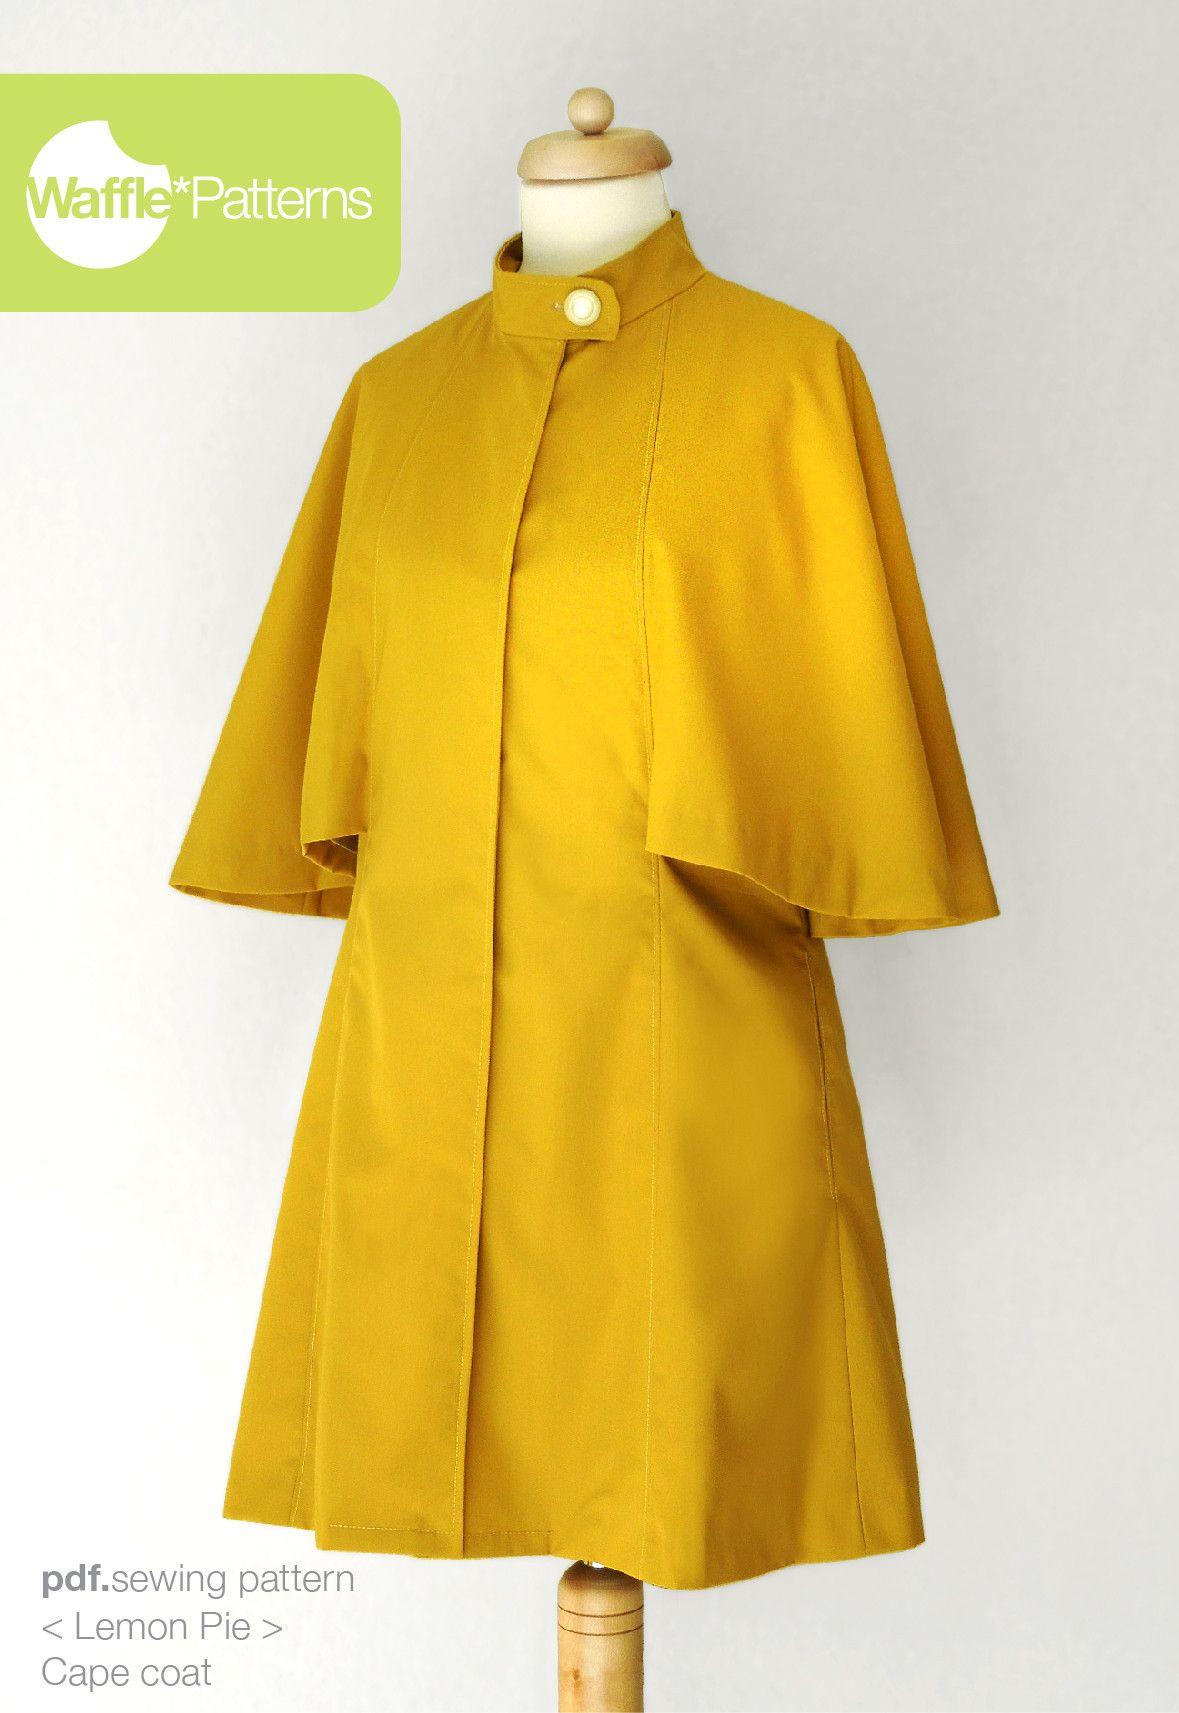 pdf sewing pattern Cape Coat -Lemon Pie- size 34-48 Waffle Patterns ...